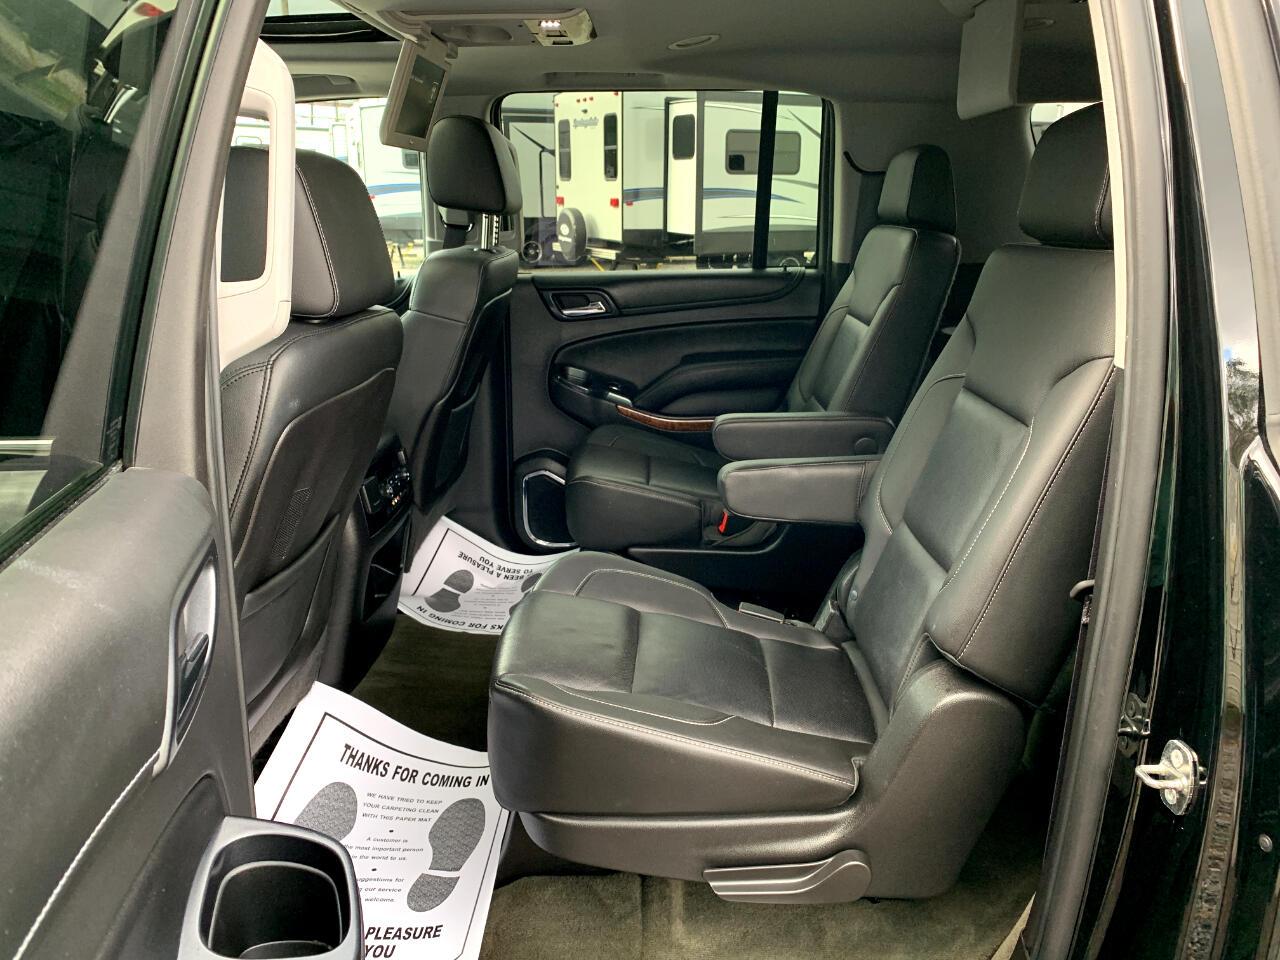 2015 Chevrolet Suburban LTZ 4WD